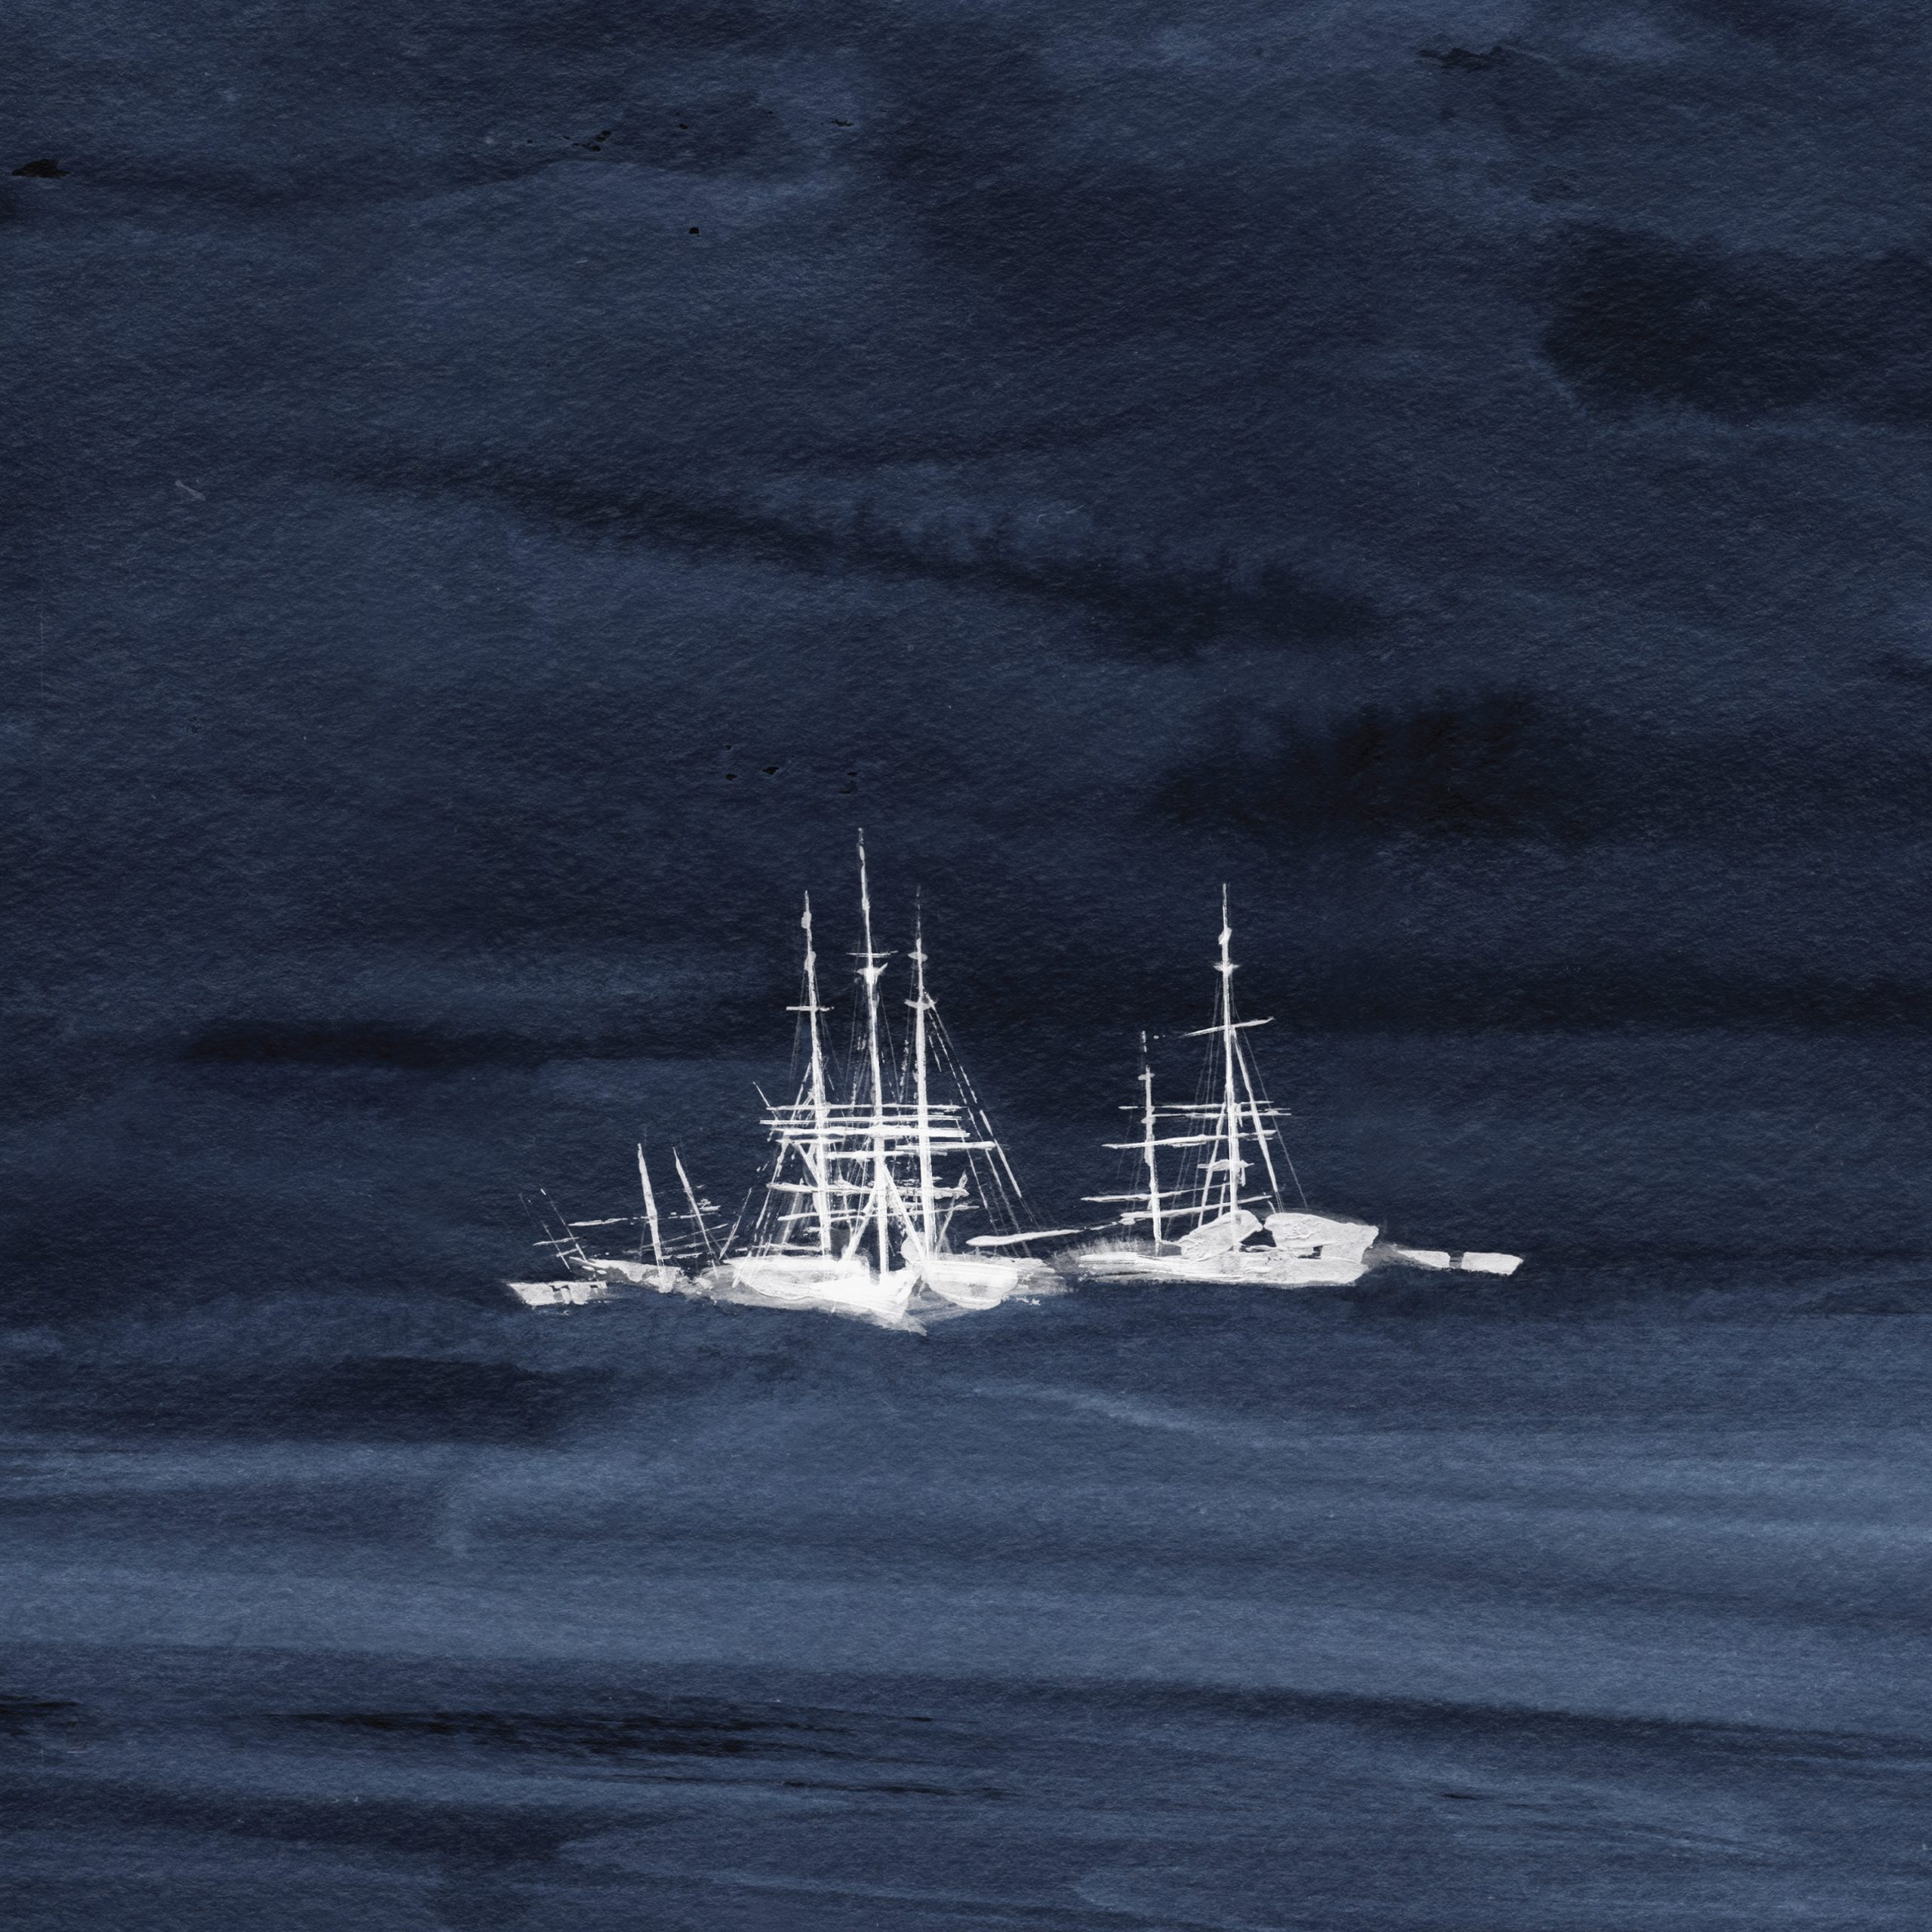 kauan-ice-fleet-album-review